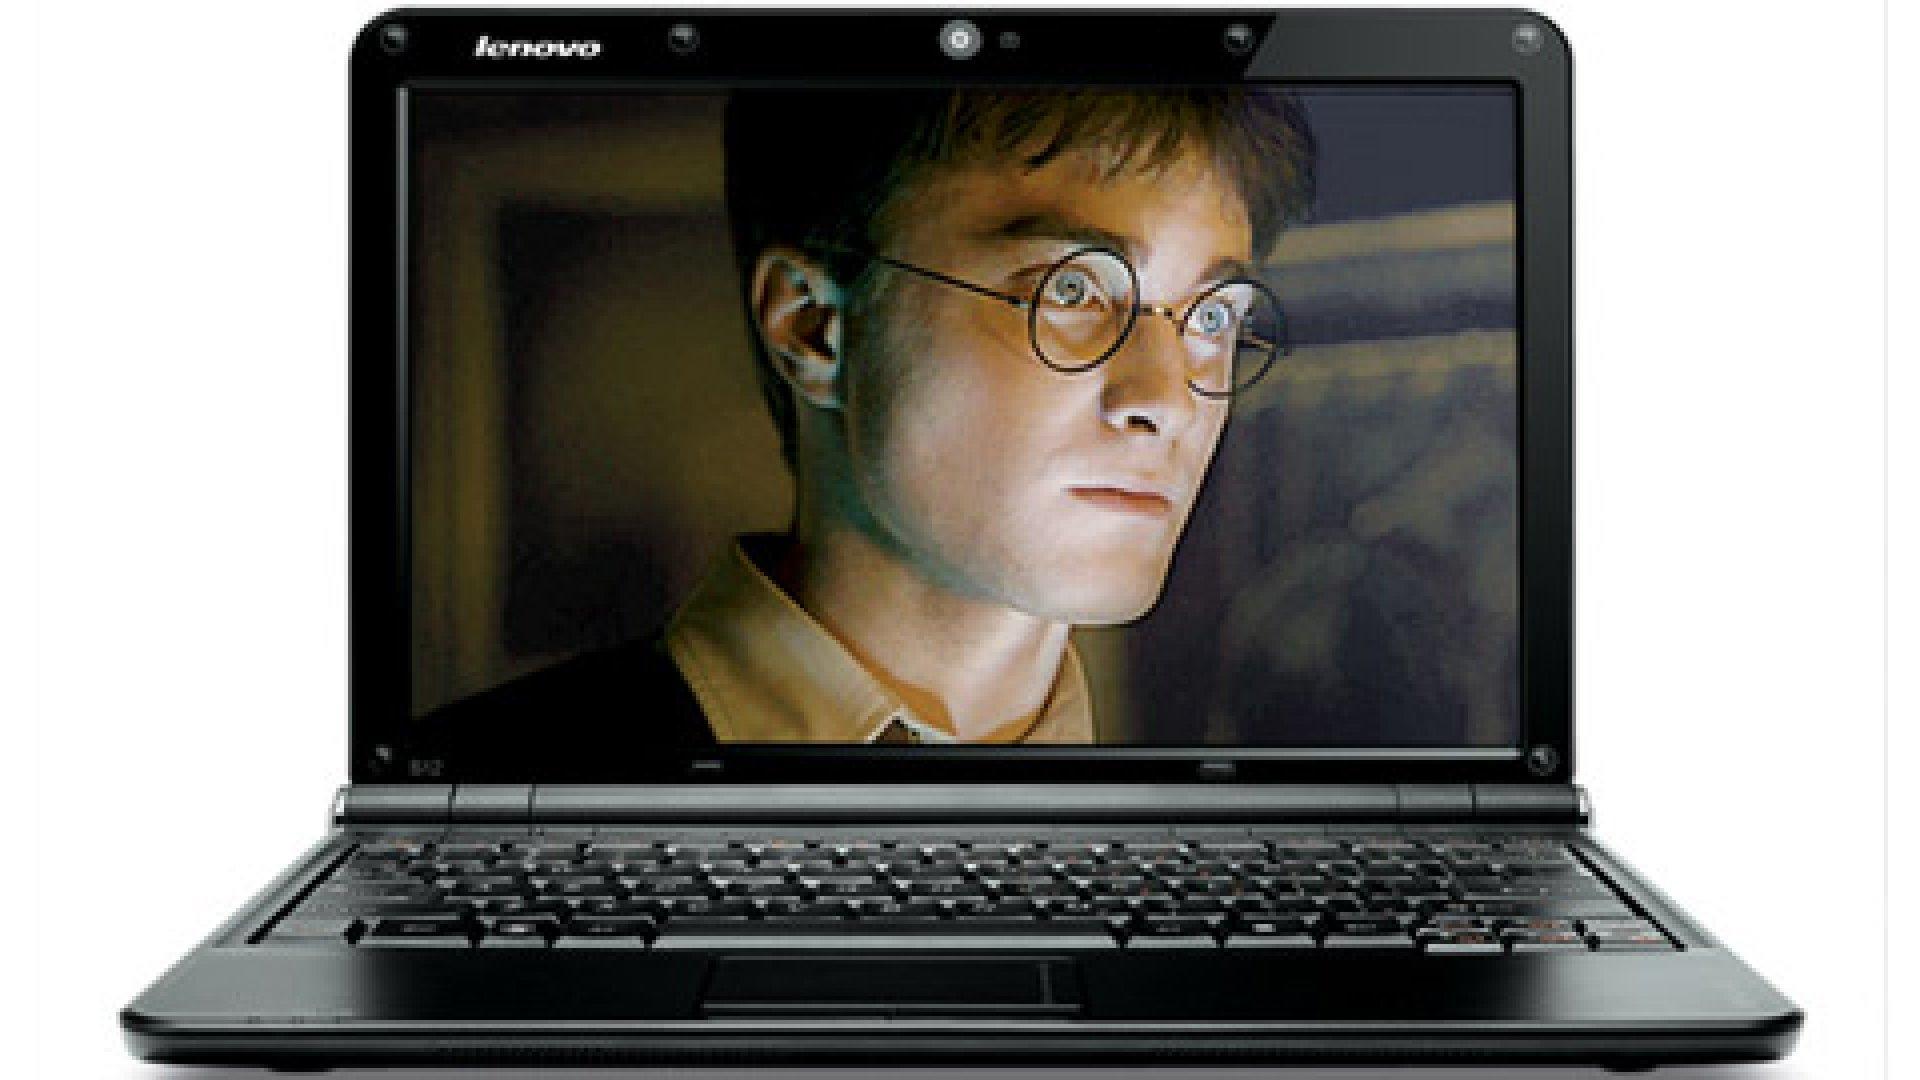 Lenovo, netbook, computer, harry potter